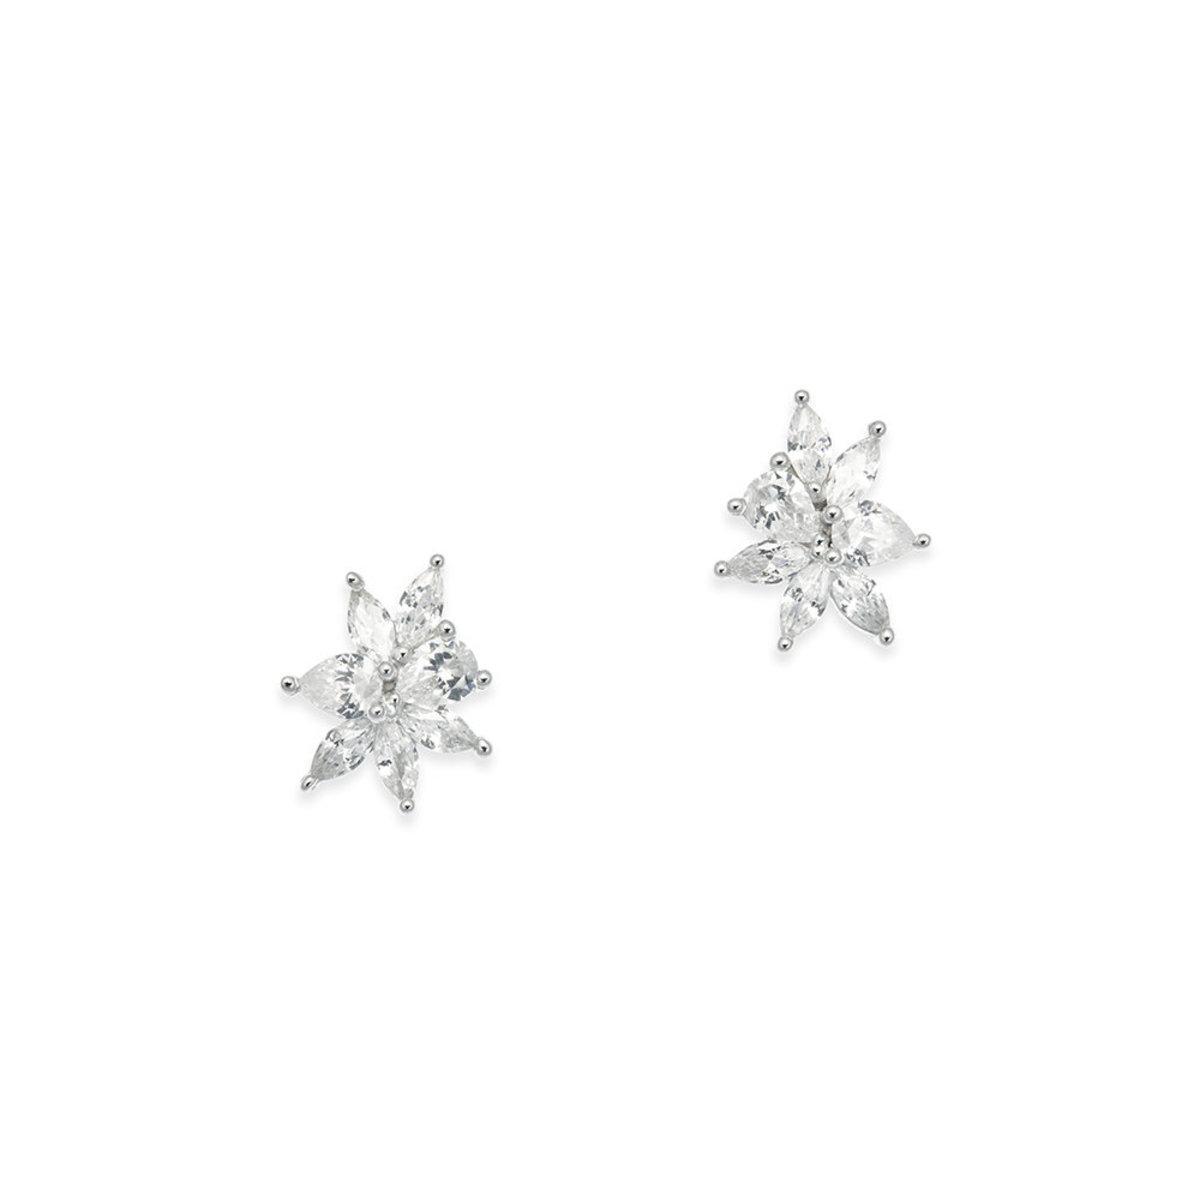 Tresor: 925 silver, rhodium plating, CZ stone pierced earrings